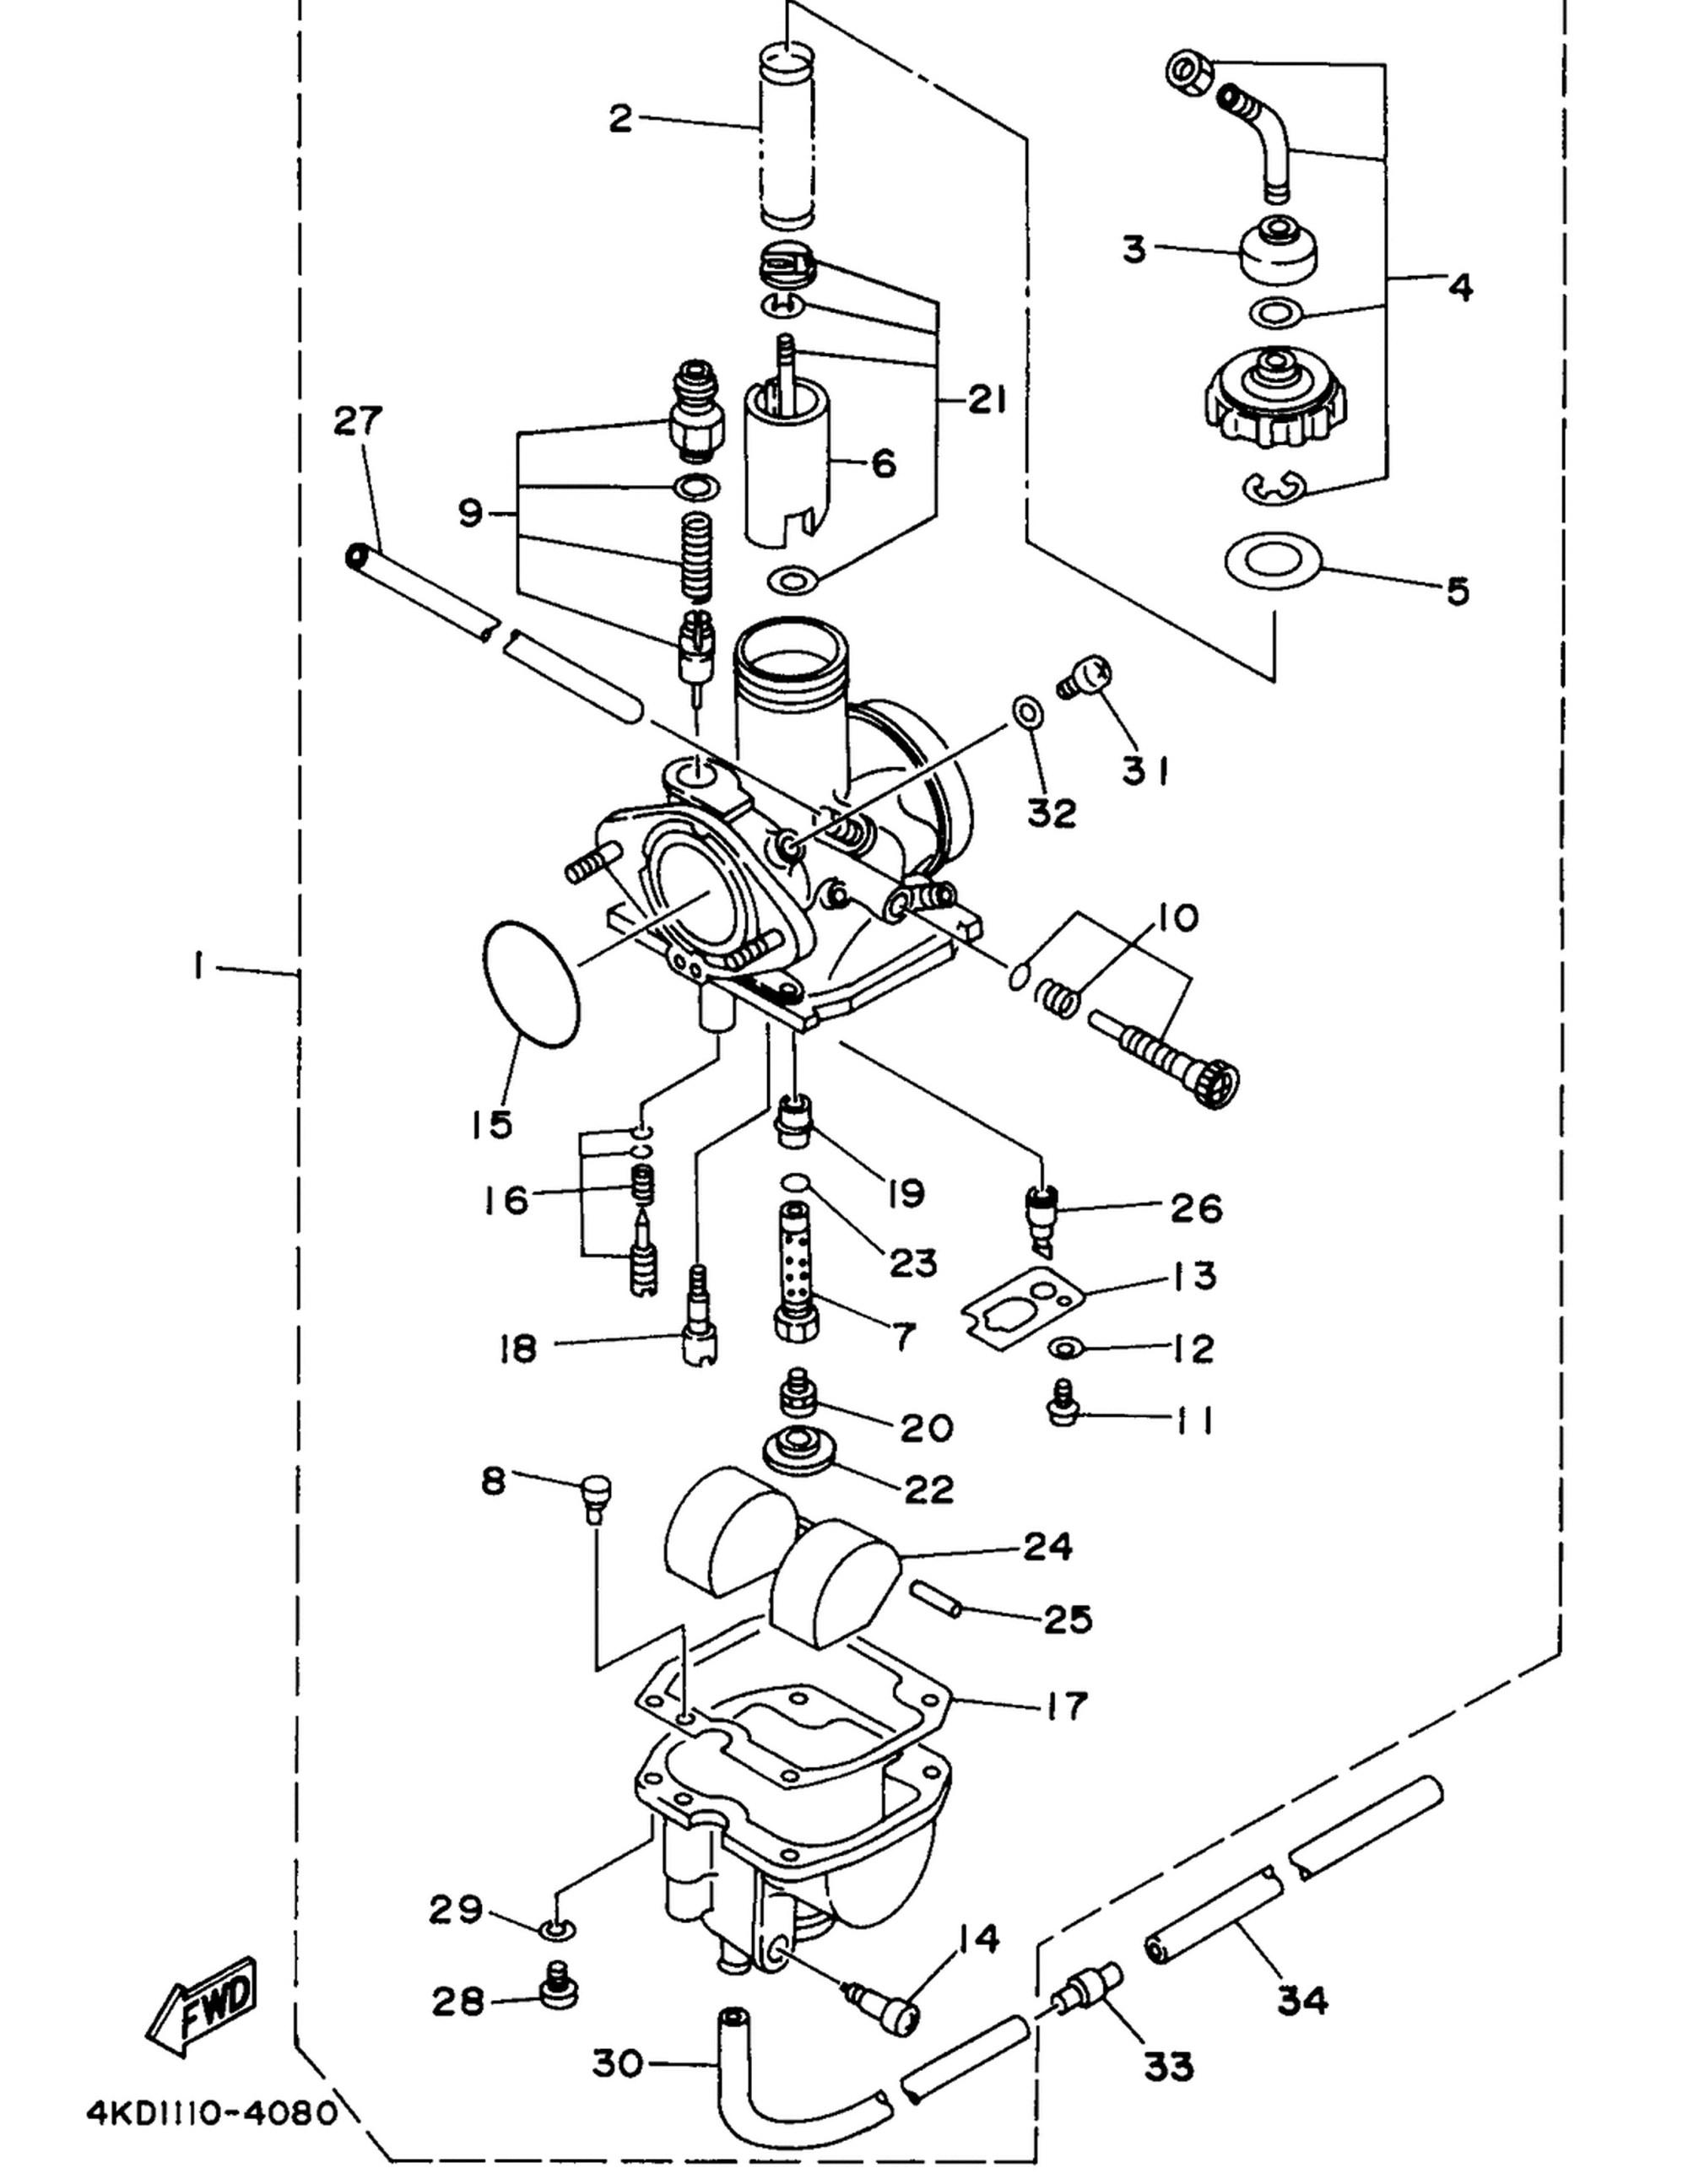 hight resolution of xsvi 6502 nav wiring diagram collection carburetor wiring diagram new 1998 yamaha timberwolf 250 2wd